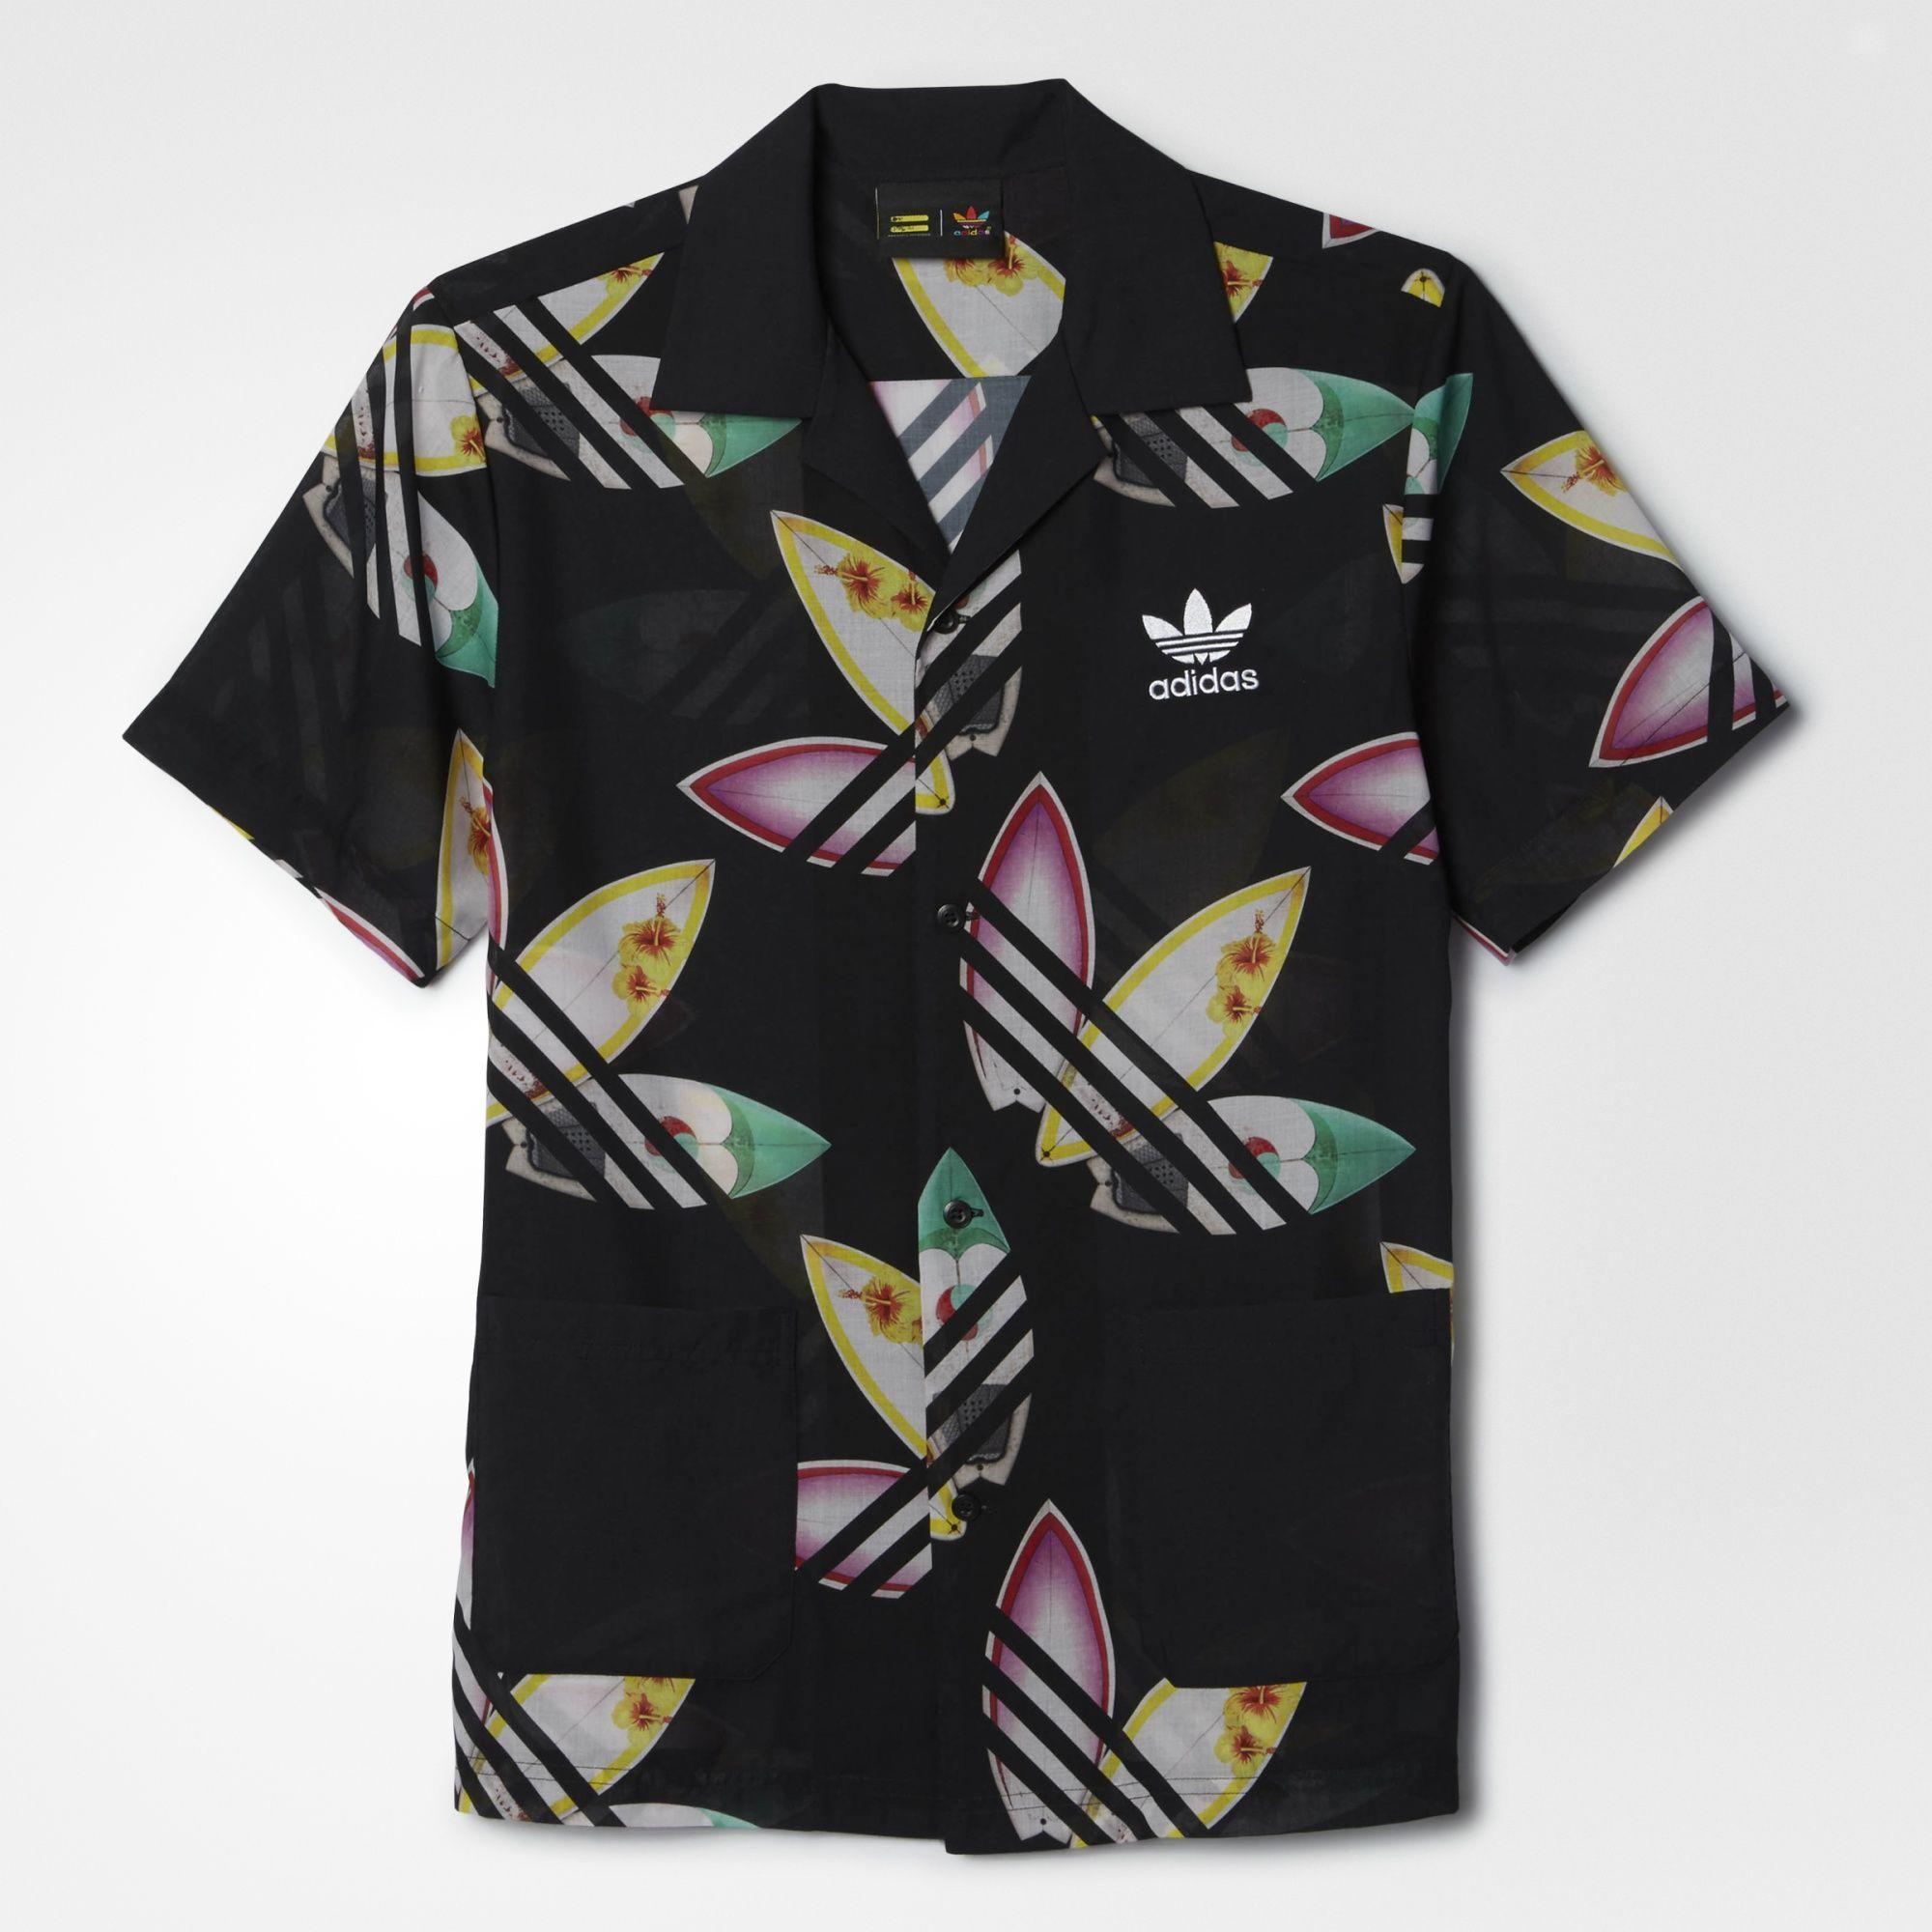 6d45e534bd adidas - Camisa Pharrell Williams Surf